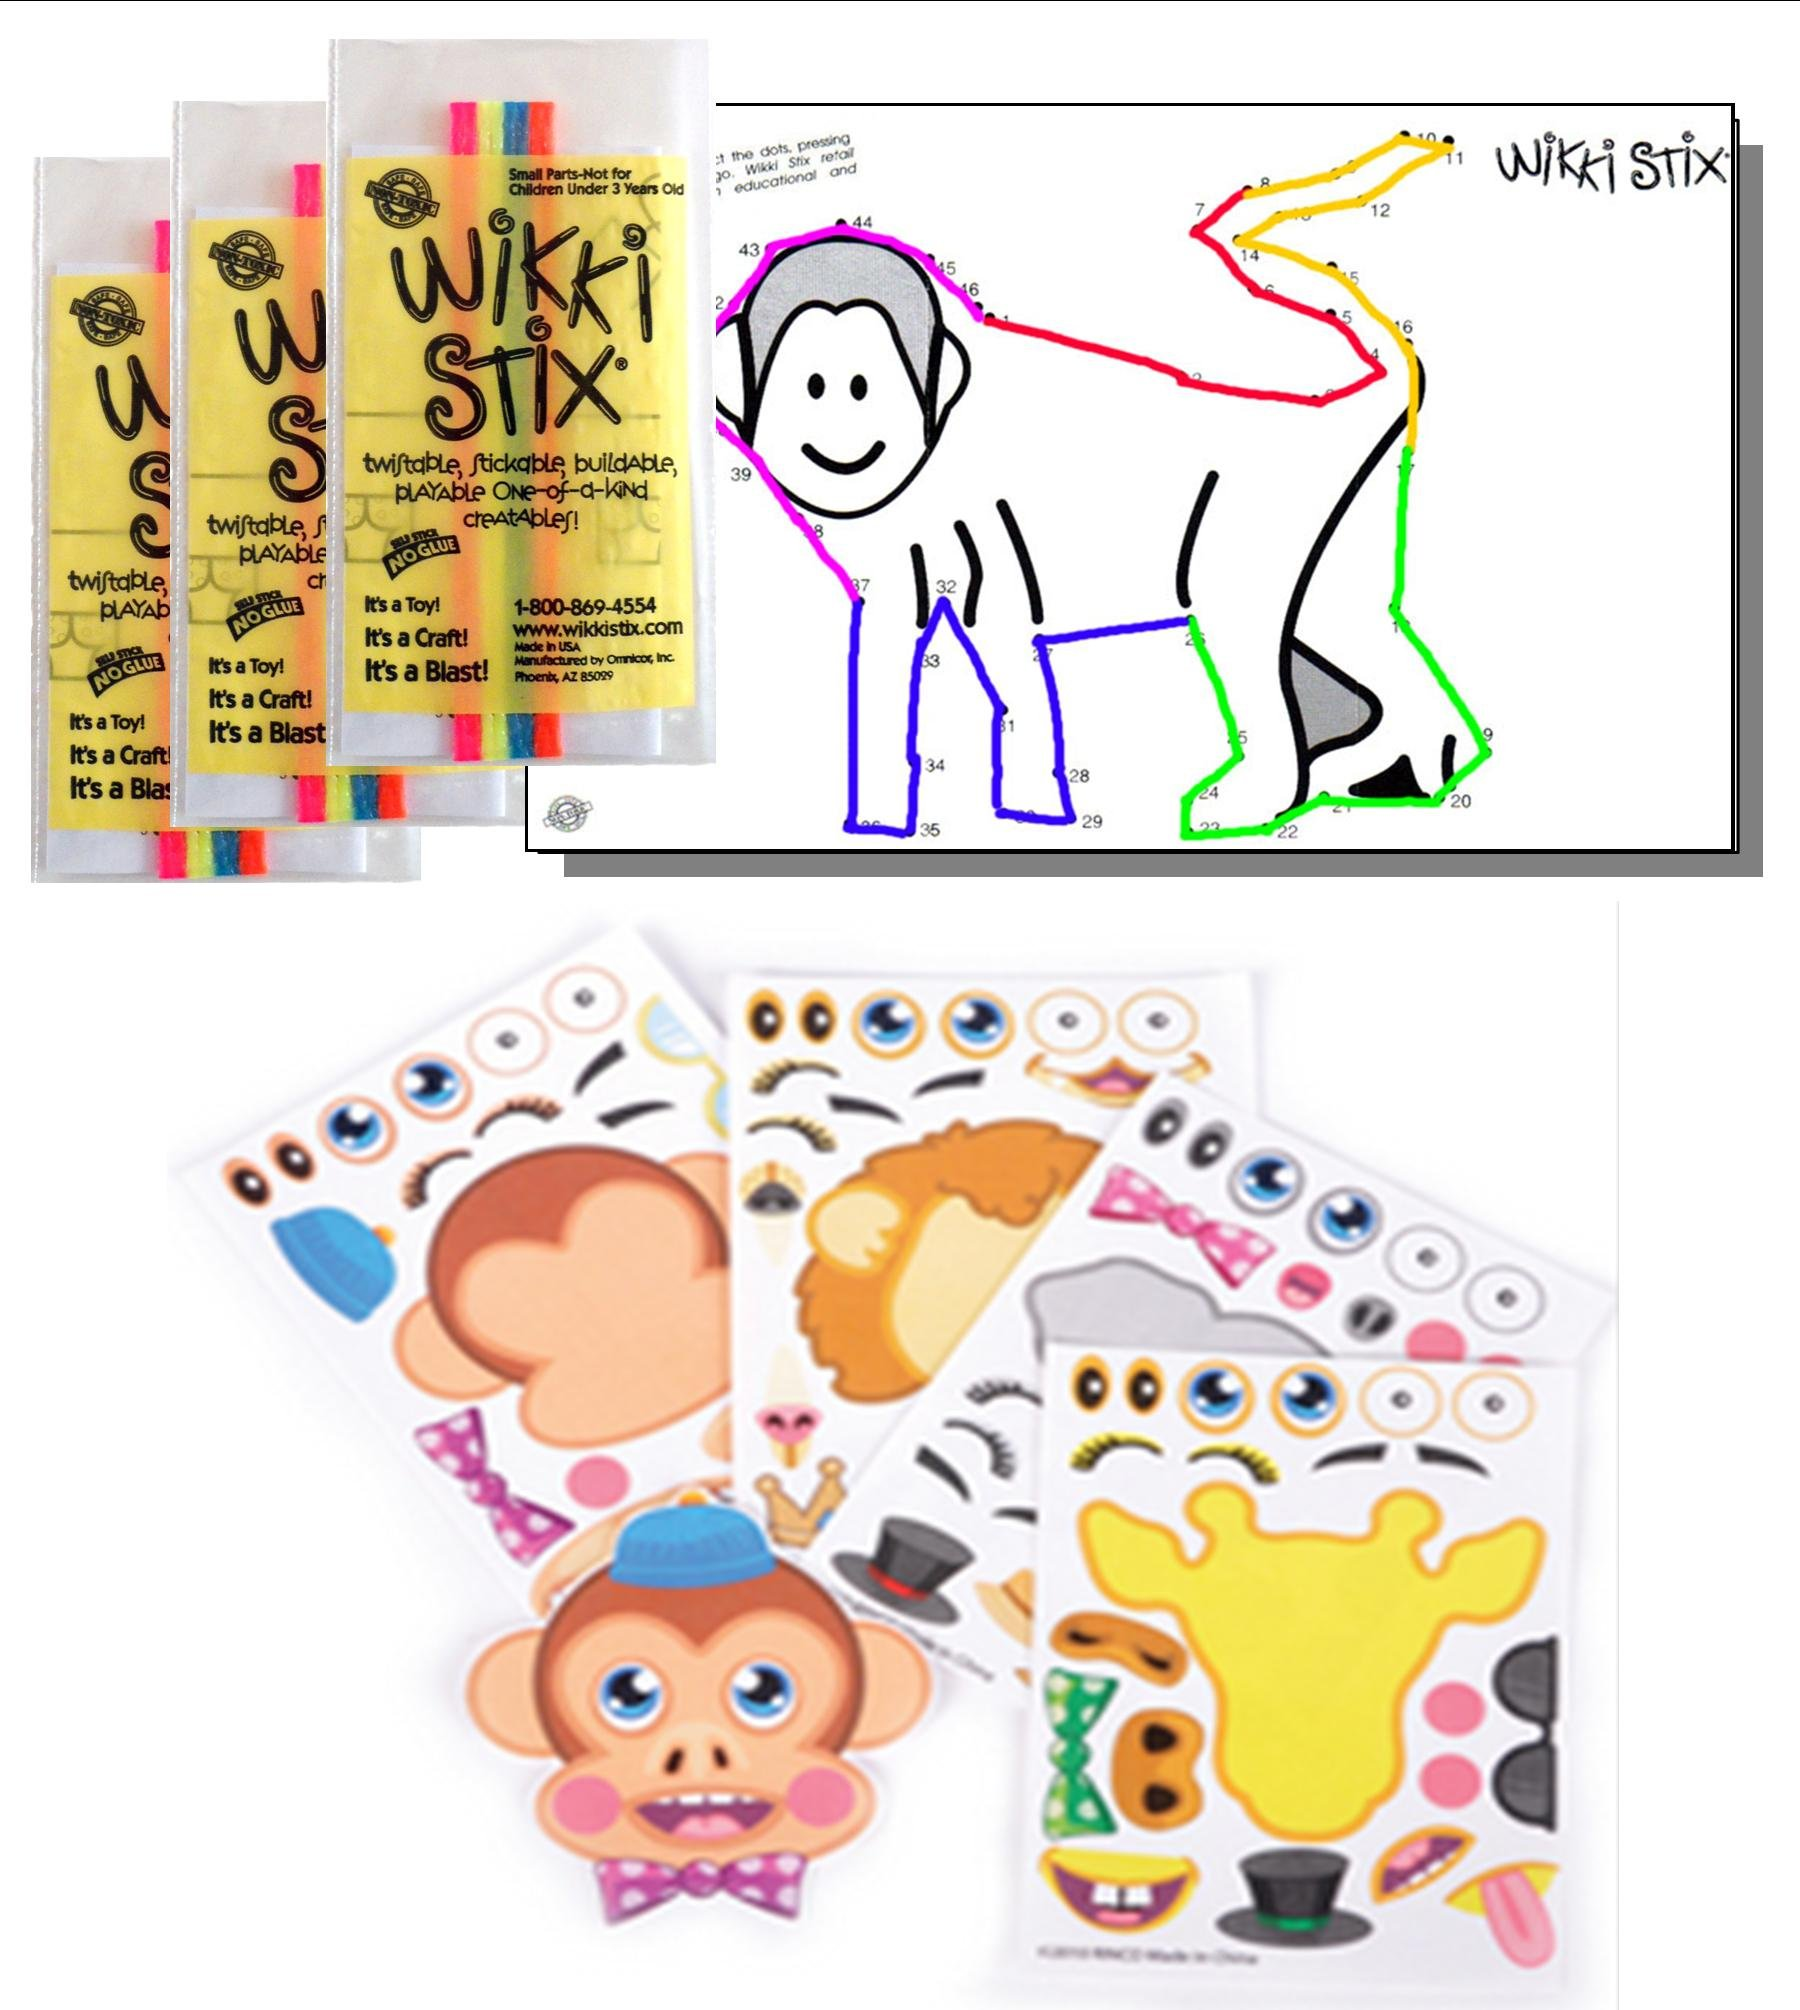 Zoo Animal Stickers & Wikki Stix Party Favor Pack - 24 Pc (12 Make-a-zoo Safari Animal Sticker Sheets & 12 Pkgs of Jungle Animal Wikki Stix)